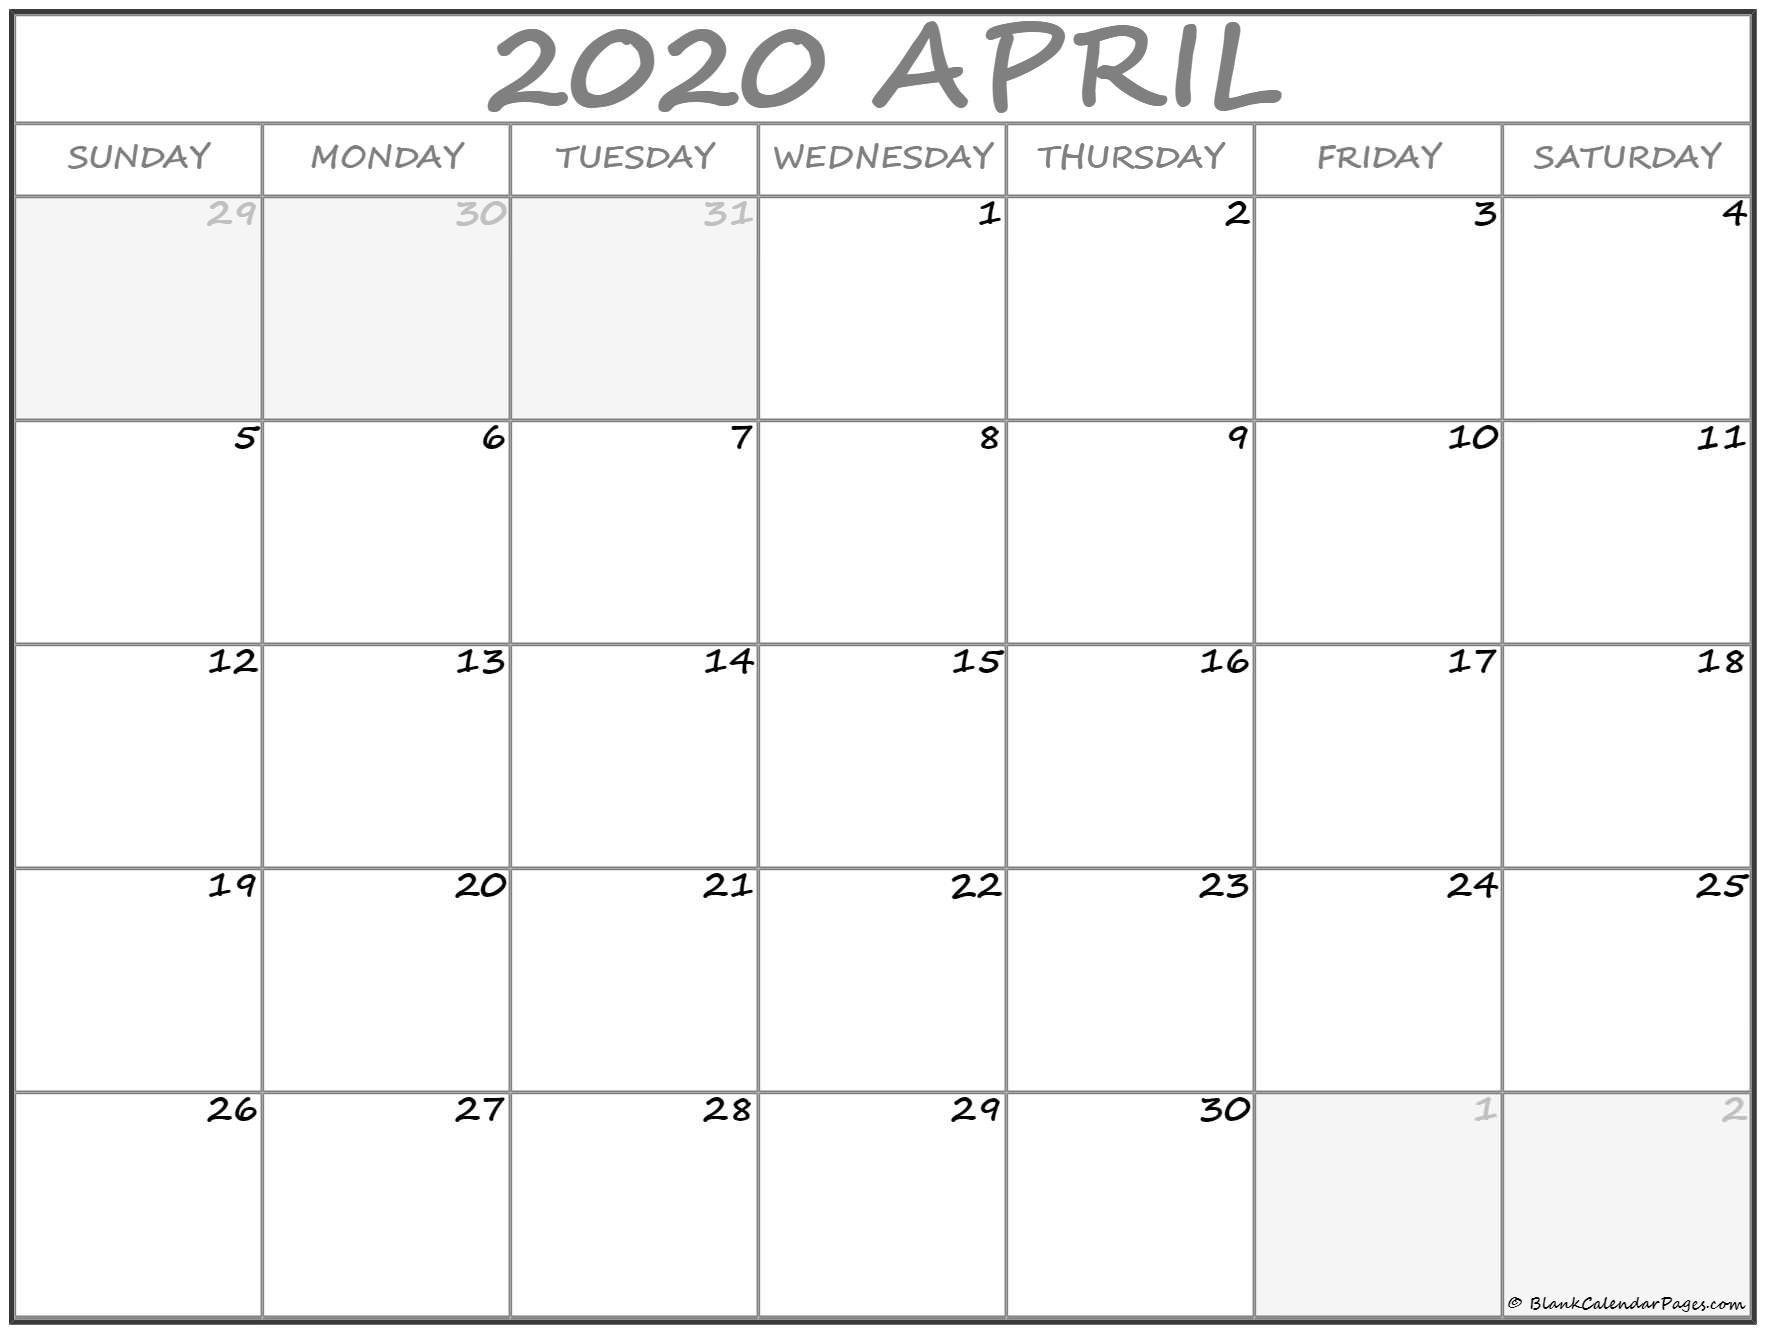 April 2020 Calendar | Free Printable Monthly Calendars Printable Month Calendar With Times